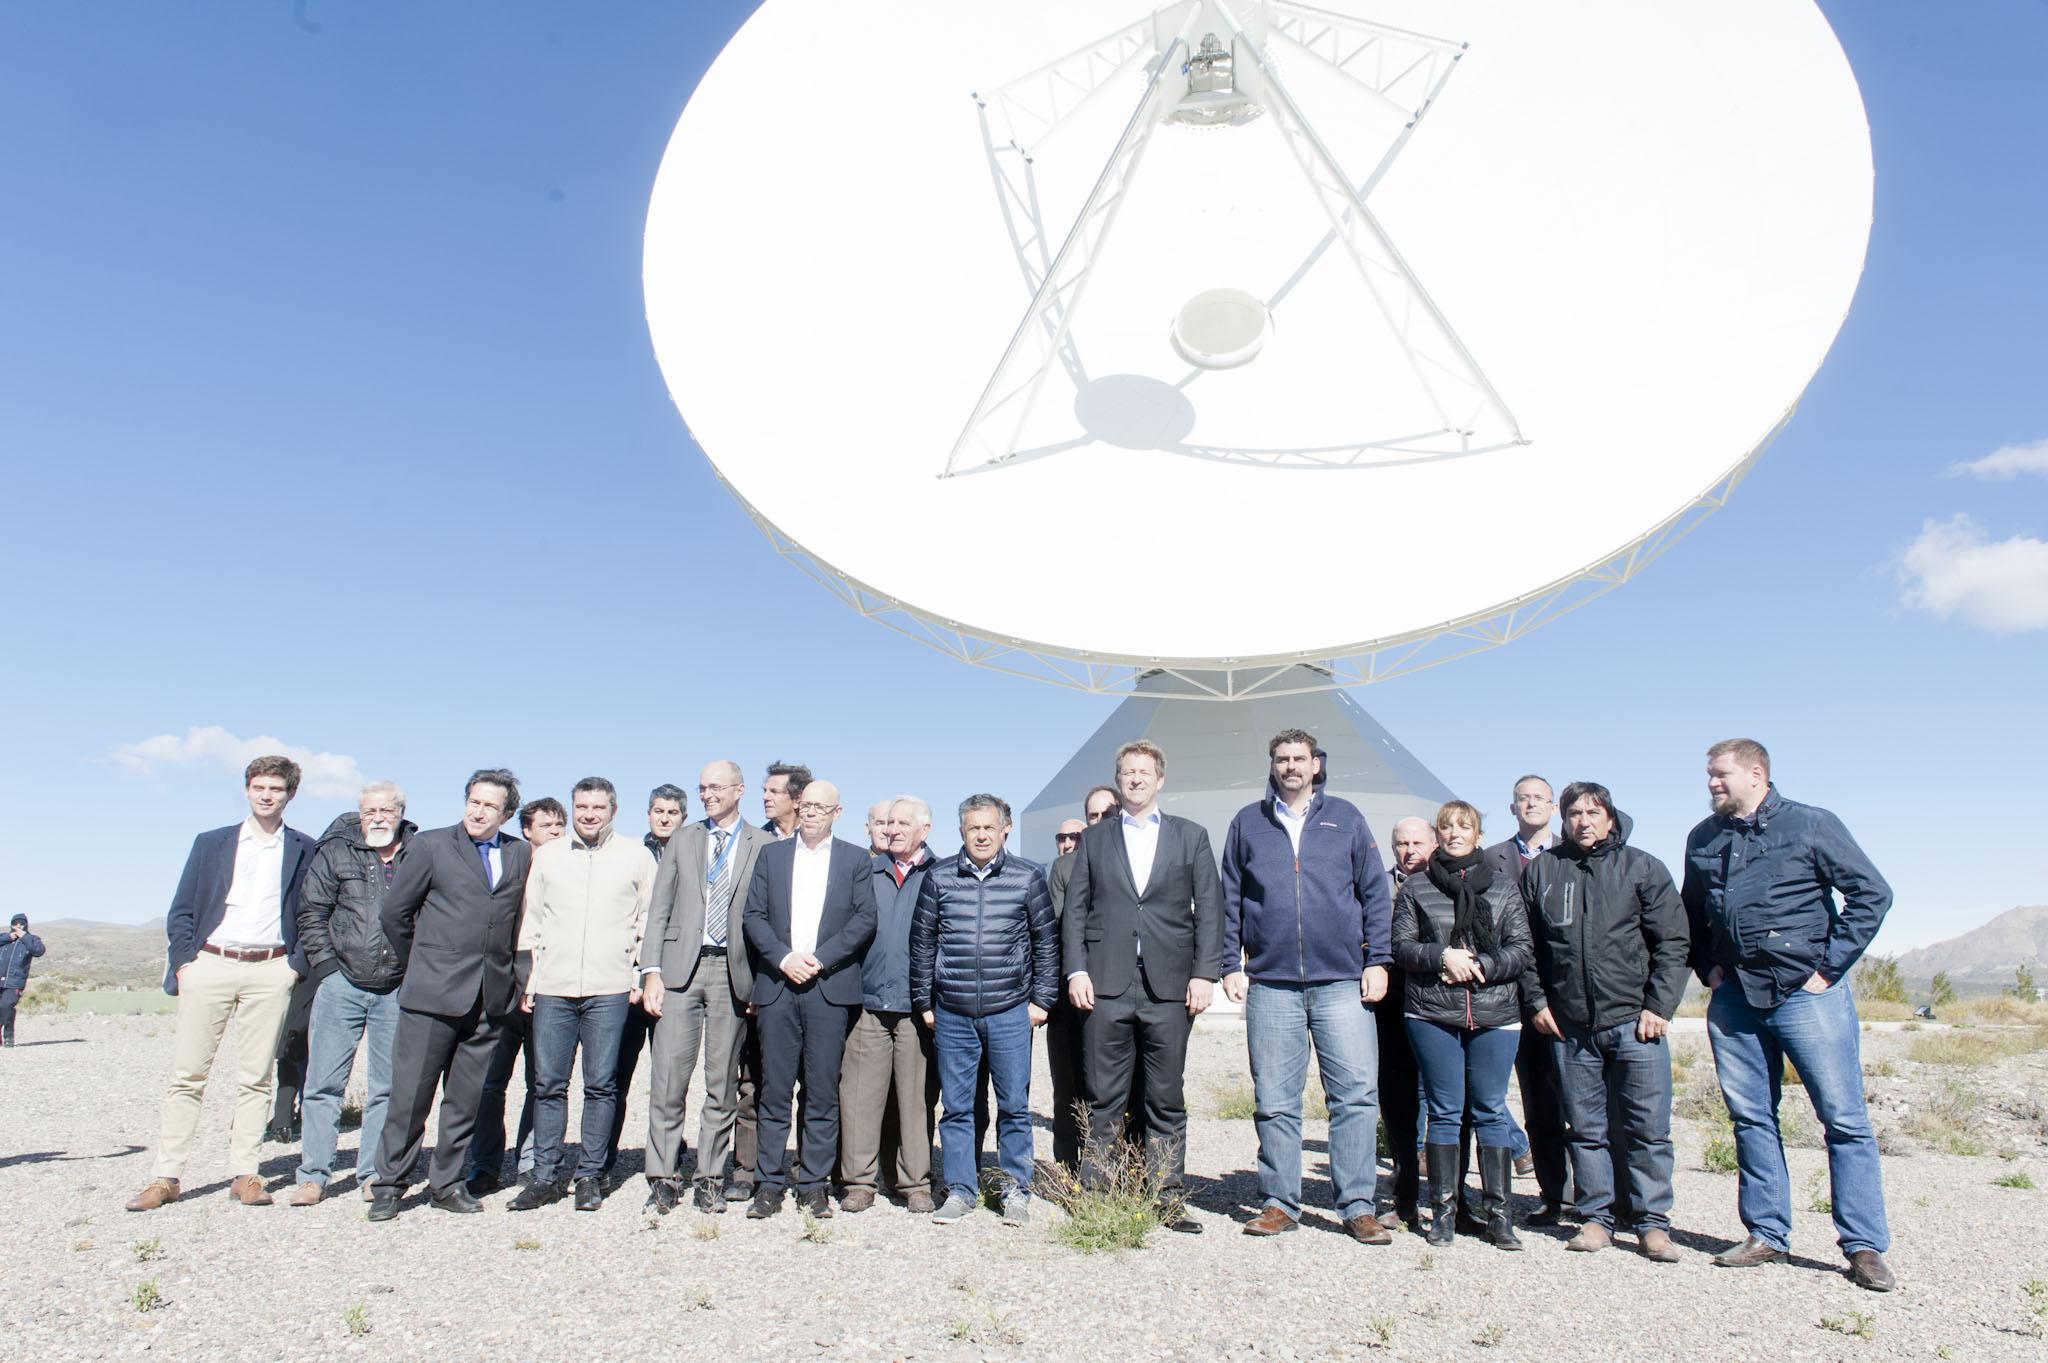 Visita a la Antena de Espacio Profundo en Malargüe – MINCyT (25-04-2017)